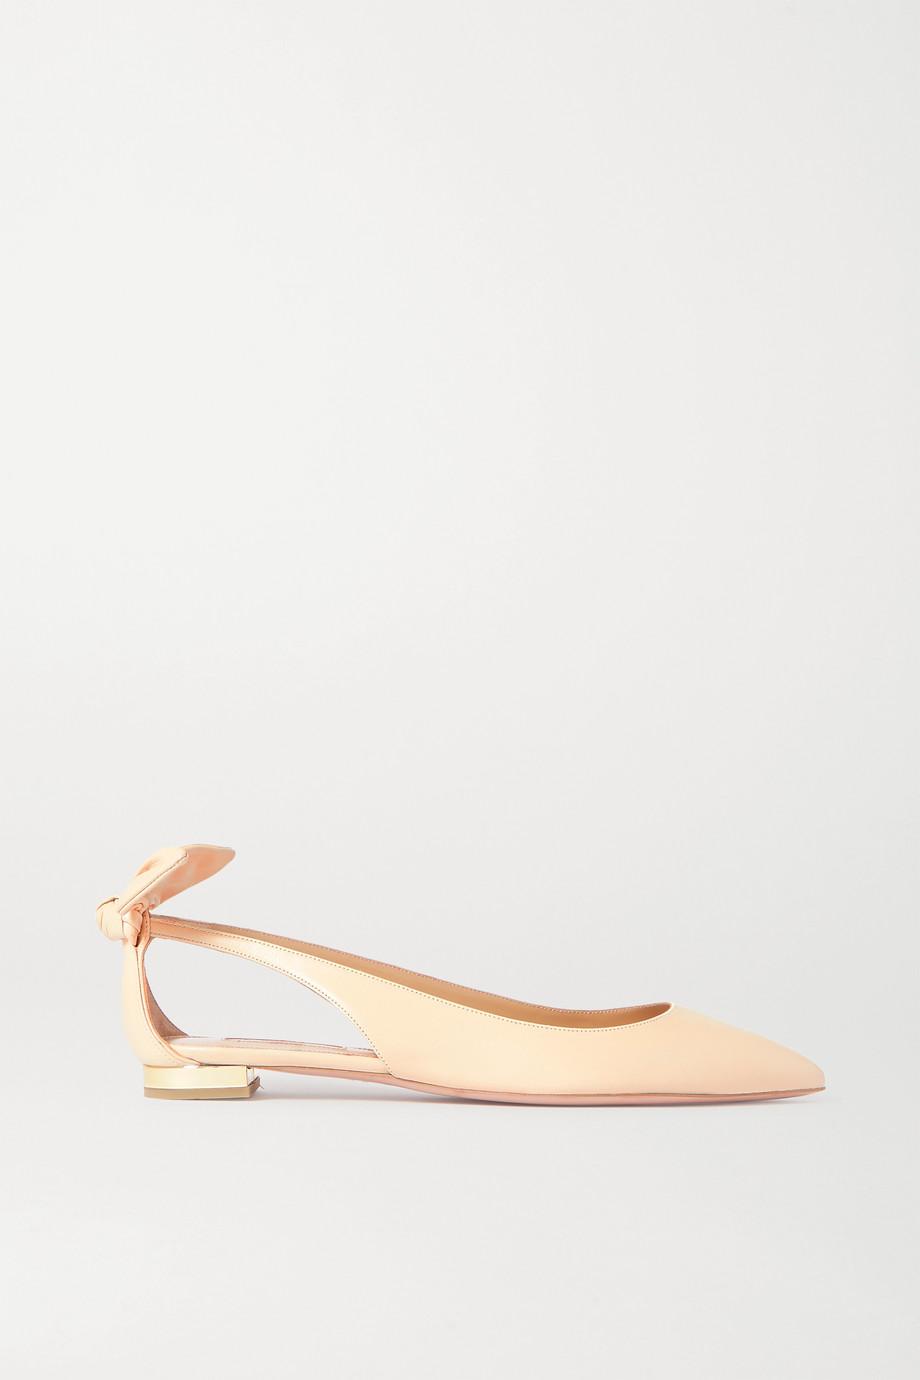 Aquazzura Bow Tie leather point-toe flats